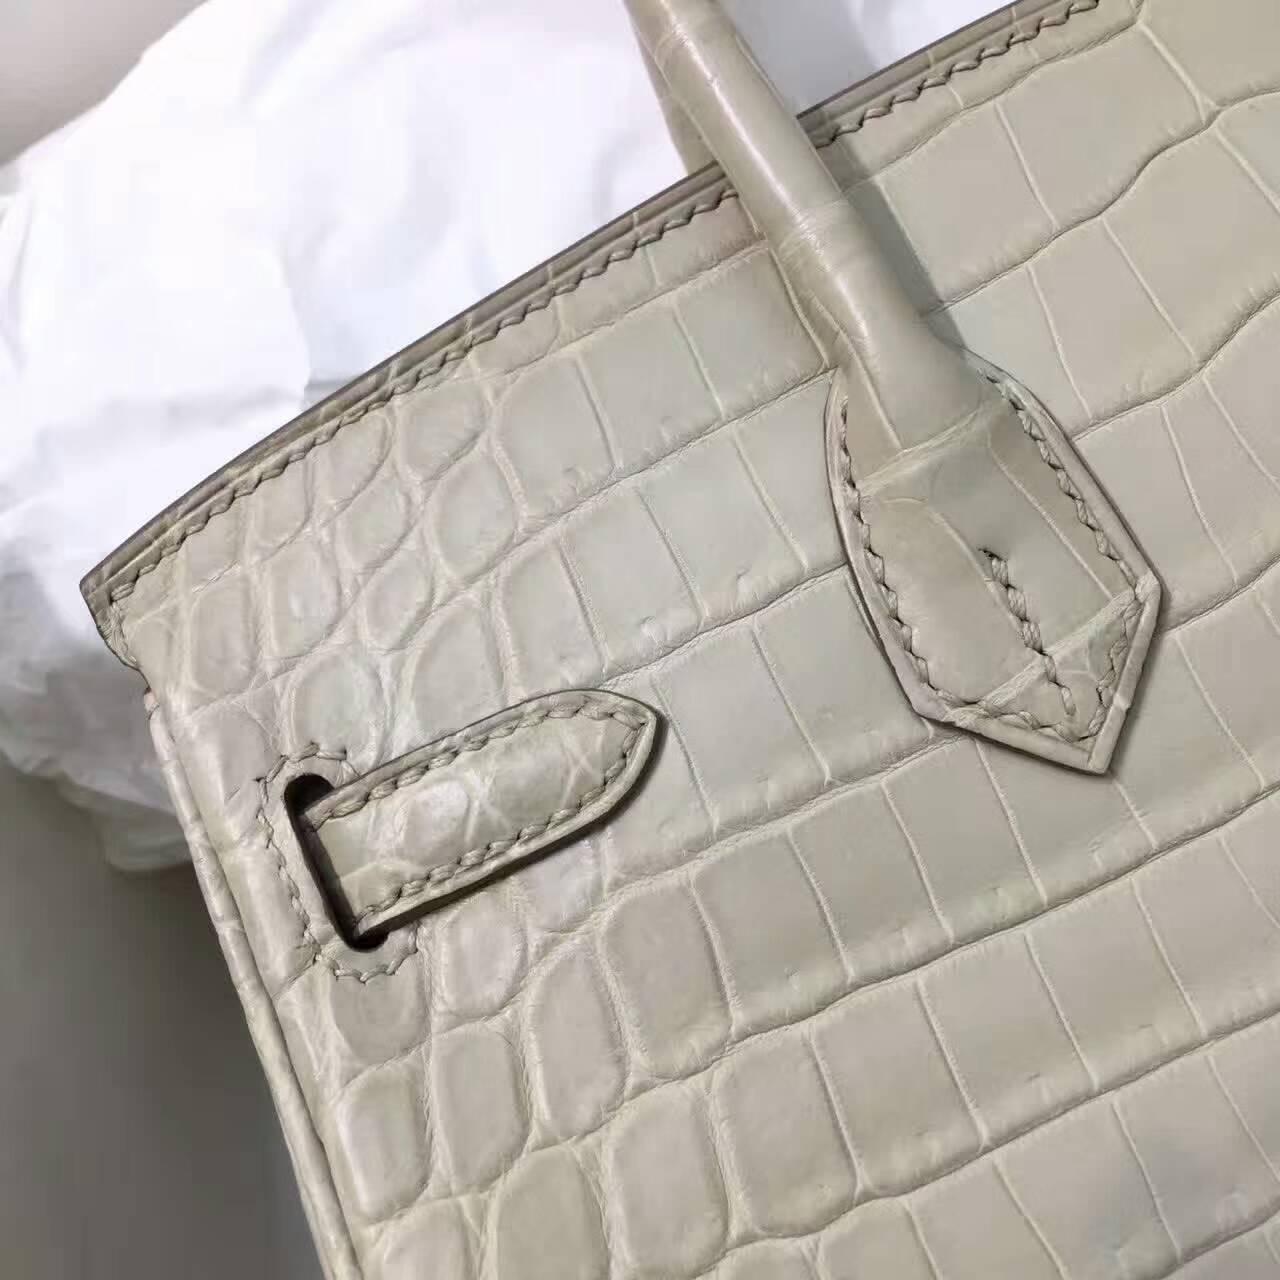 Birkin铂金包 Hermes包包 25cm Shiny Niloticus Crocodile 雾面两点非洲原产尼罗鳄 8L Beton 奶油白